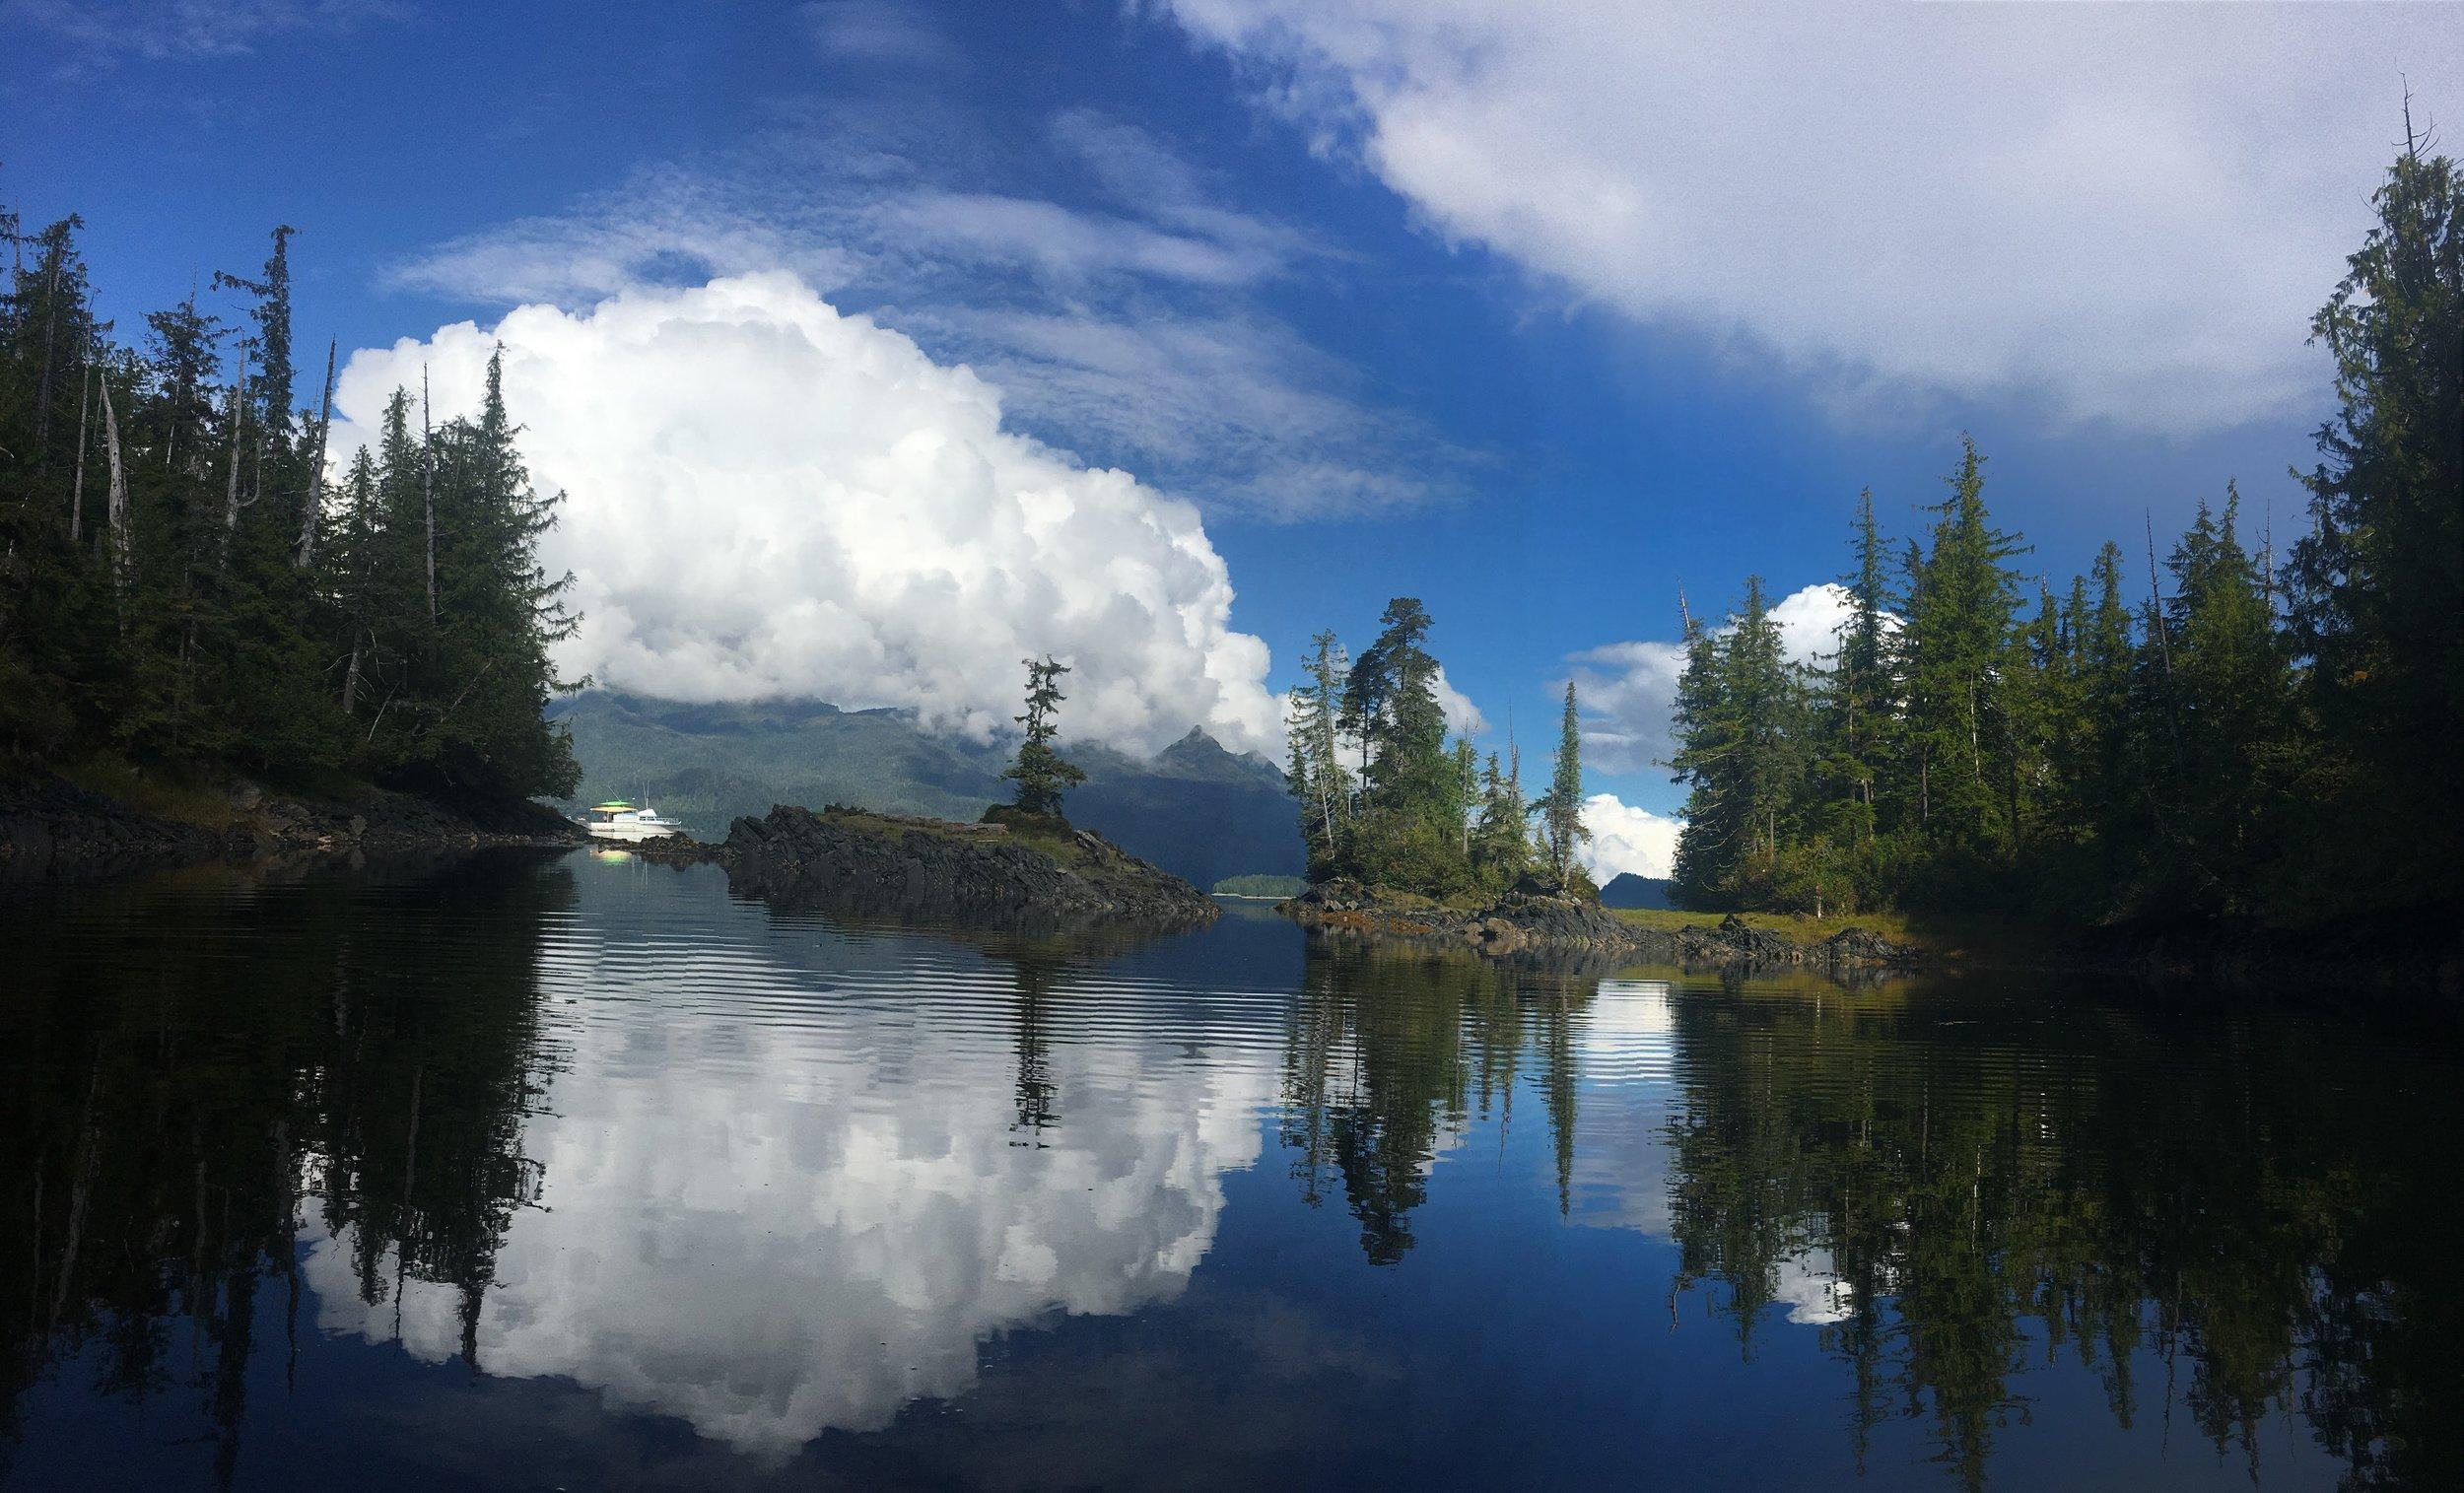 Take in the beauty of wild Alaska